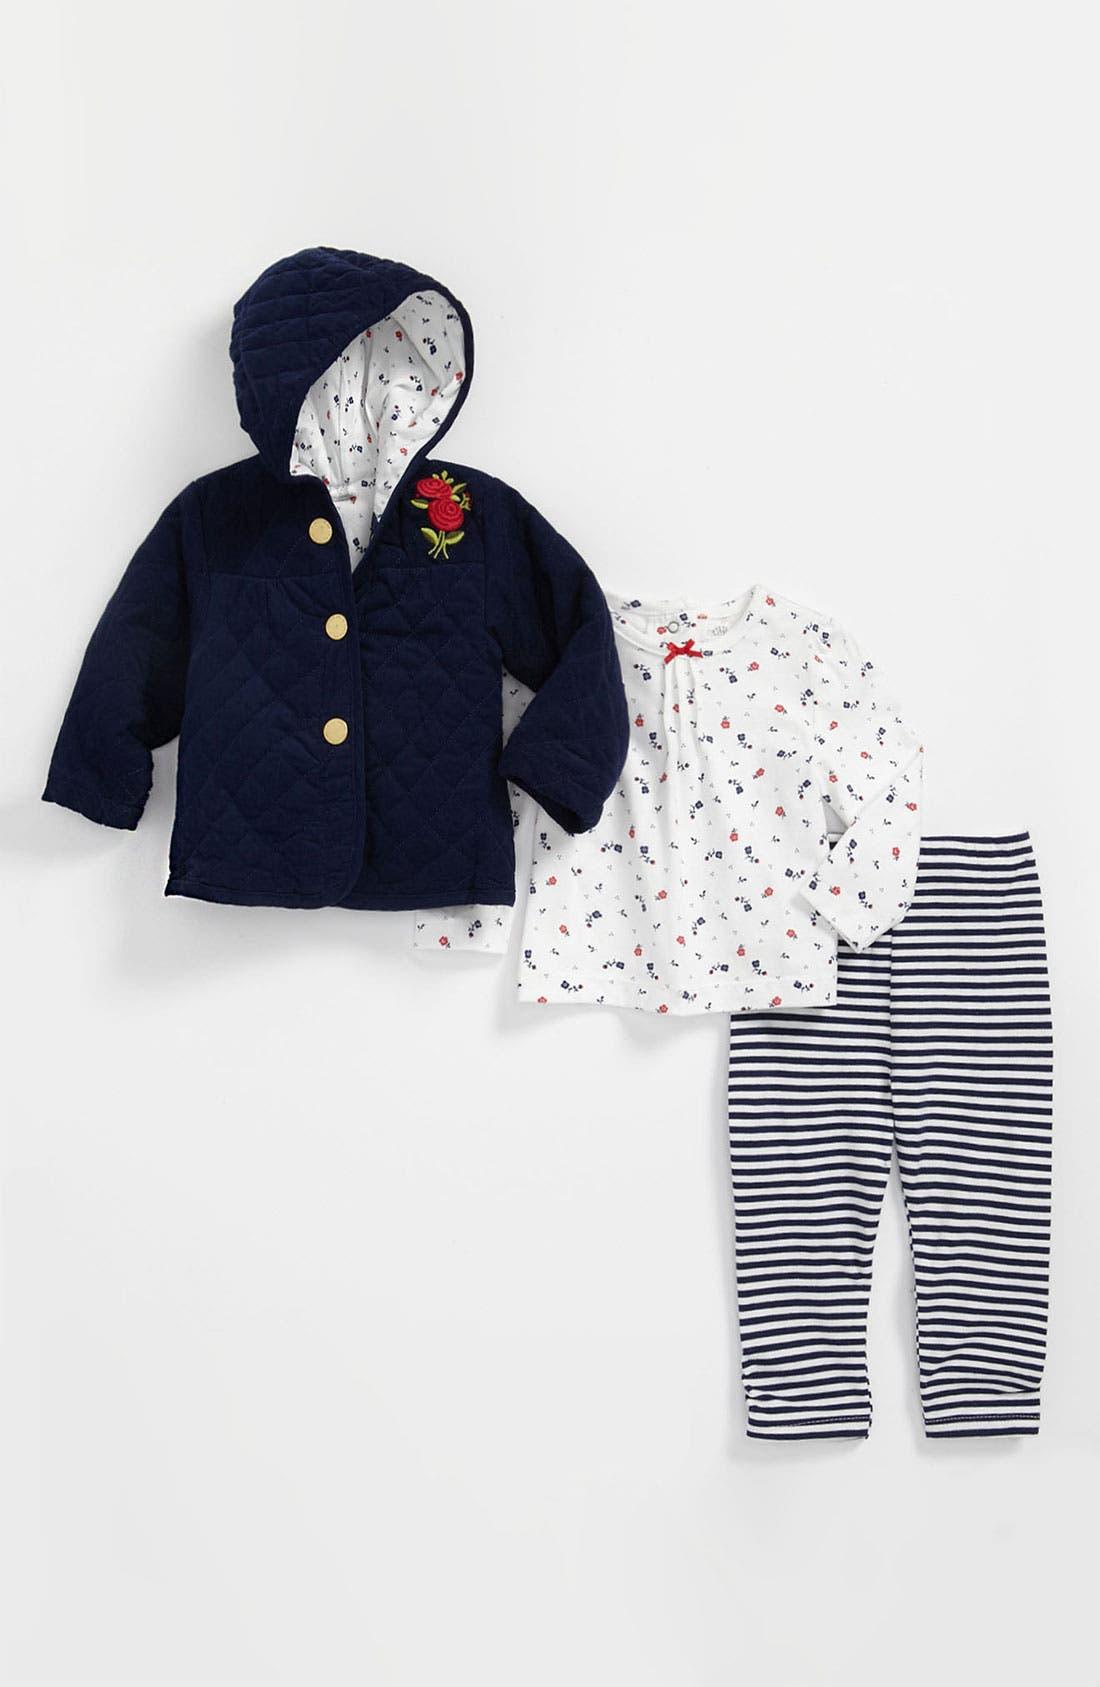 Alternate Image 1 Selected - Little Me 'Navy Rose' Top, Leggings & Jacket (Infant)